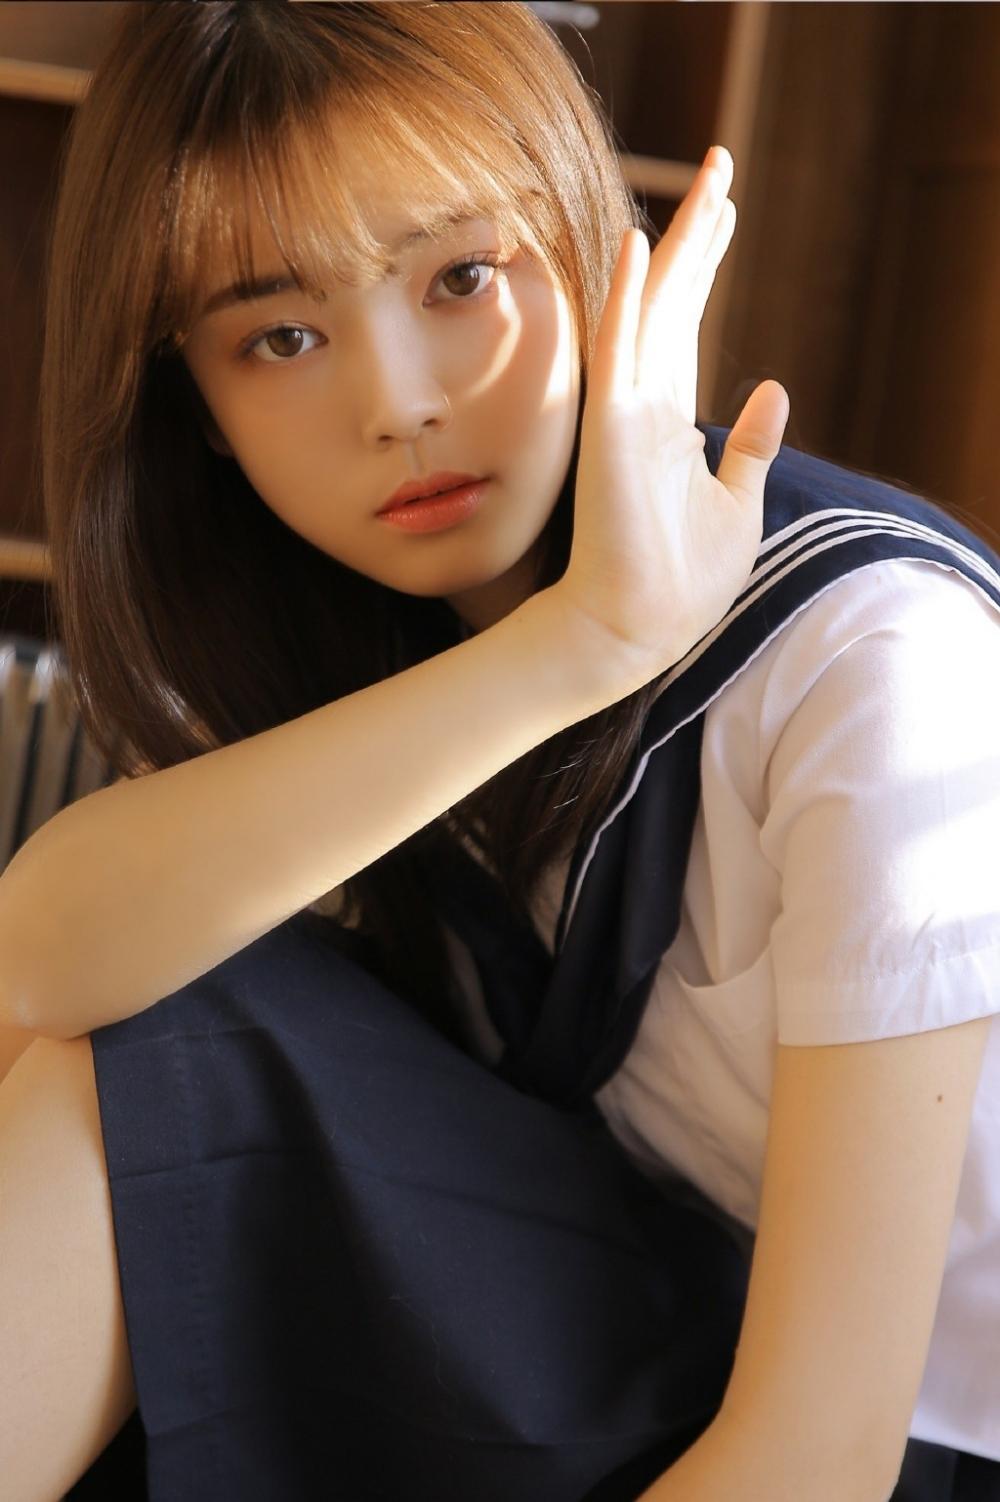 JUY-349中国旗袍诱惑美女carry黑丝翘臀高跟美腿性感写真